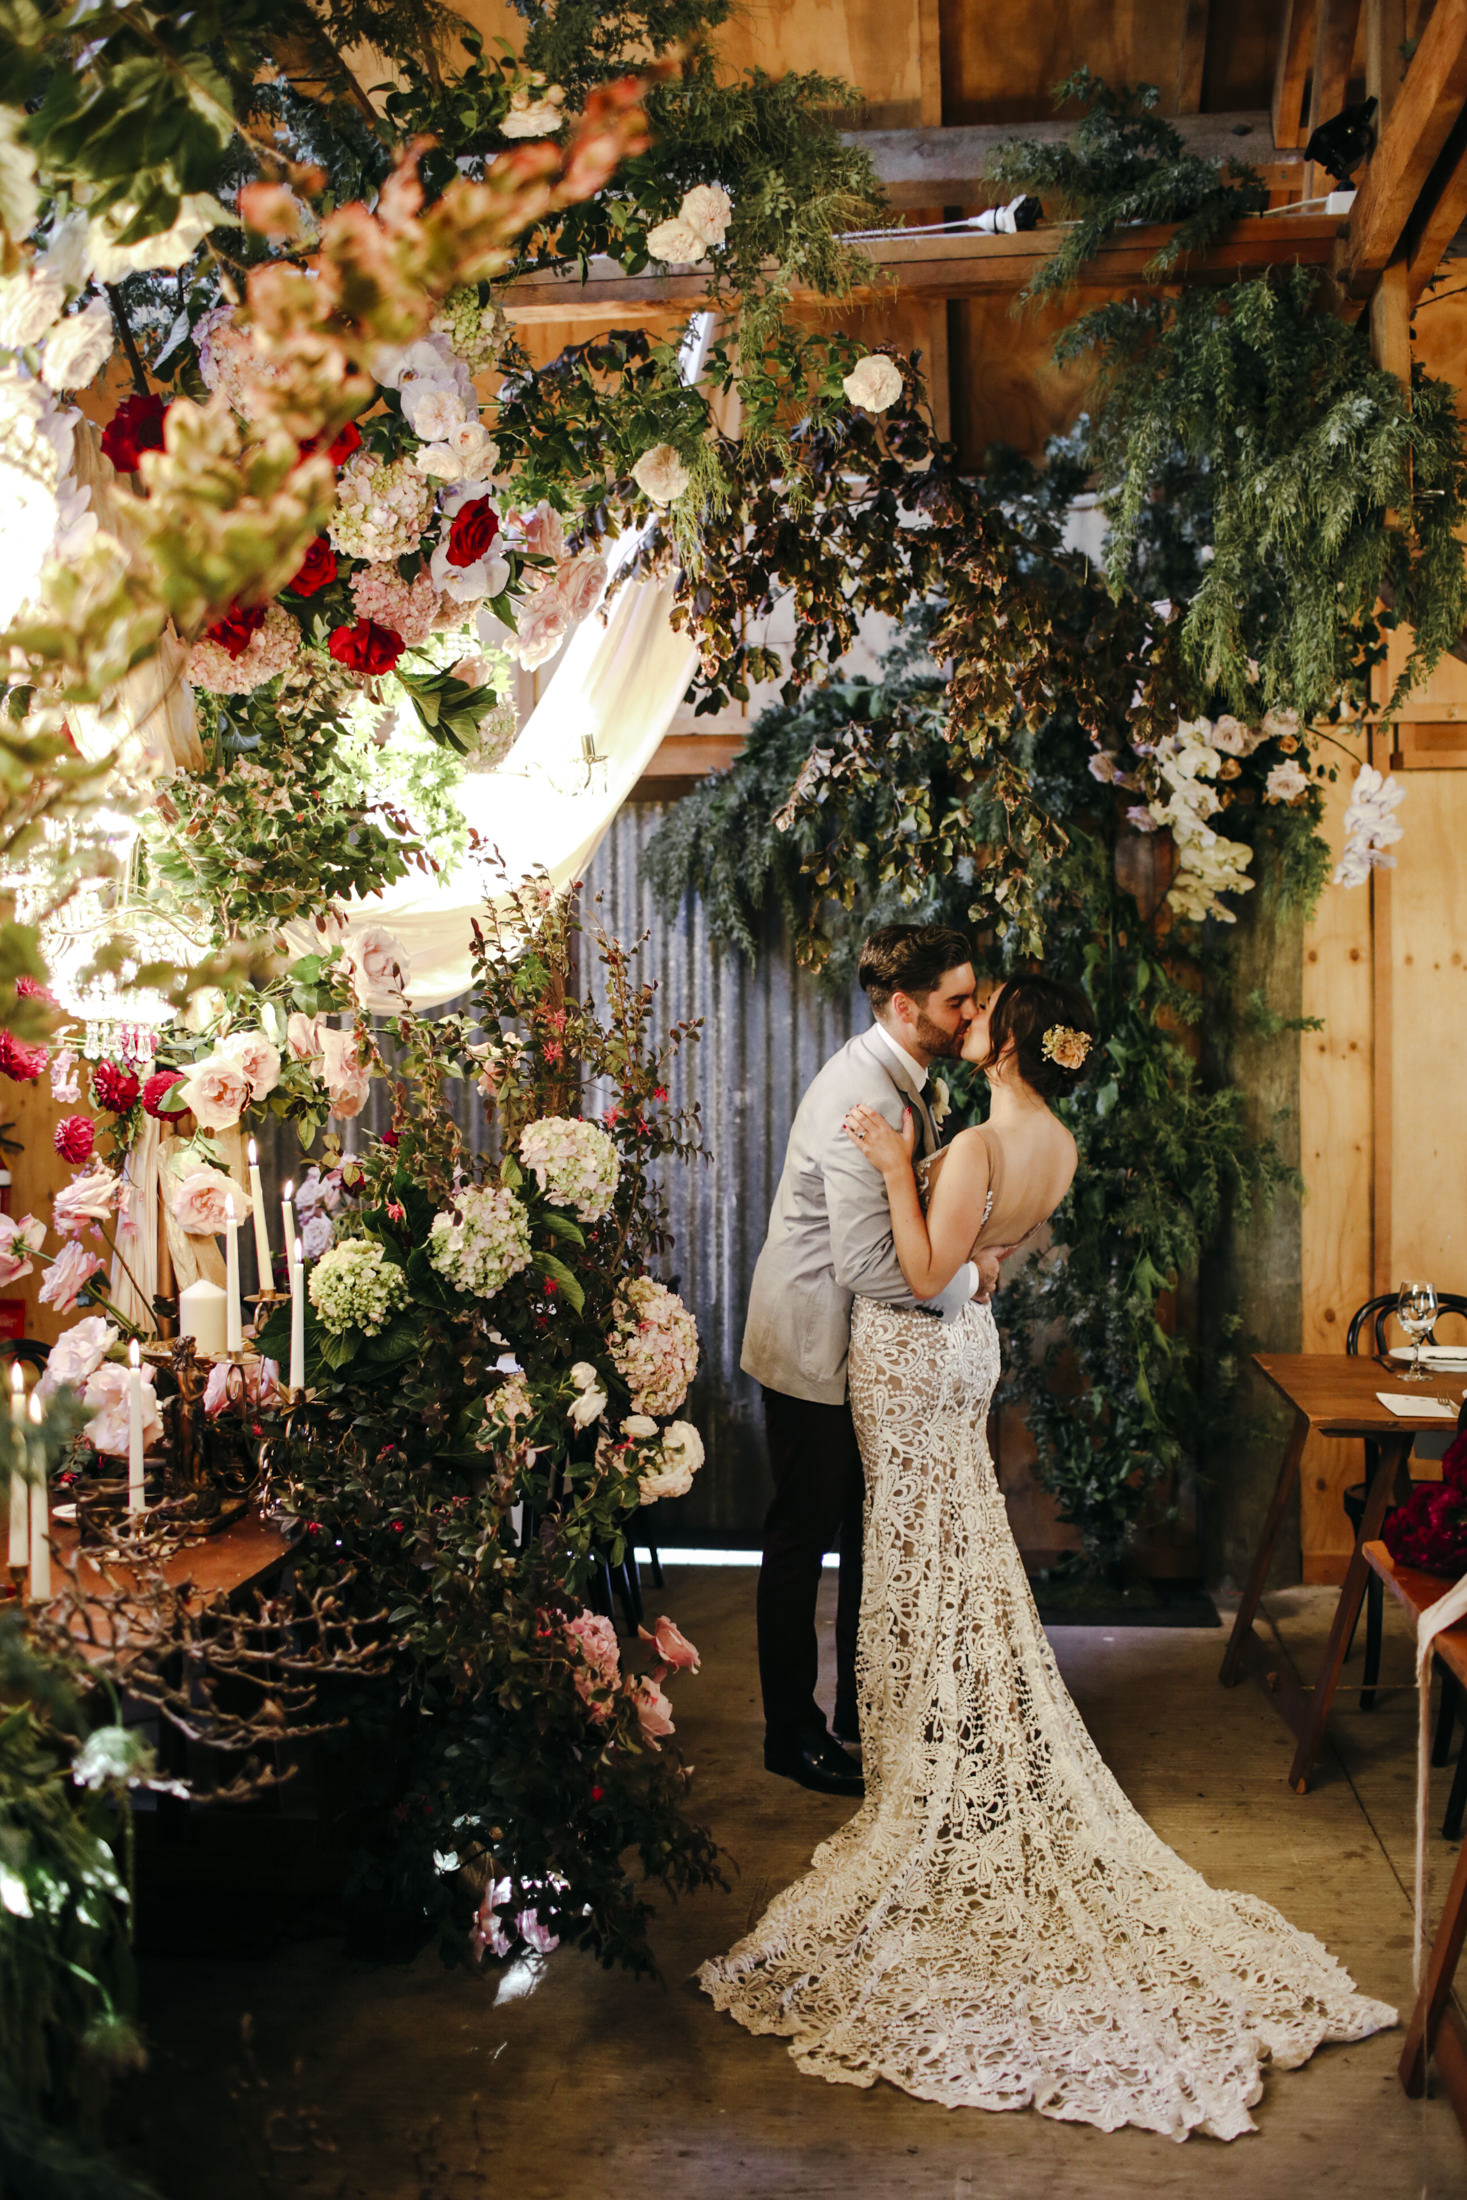 Amelia + Jono Secret Garden Kissing Couple Loved